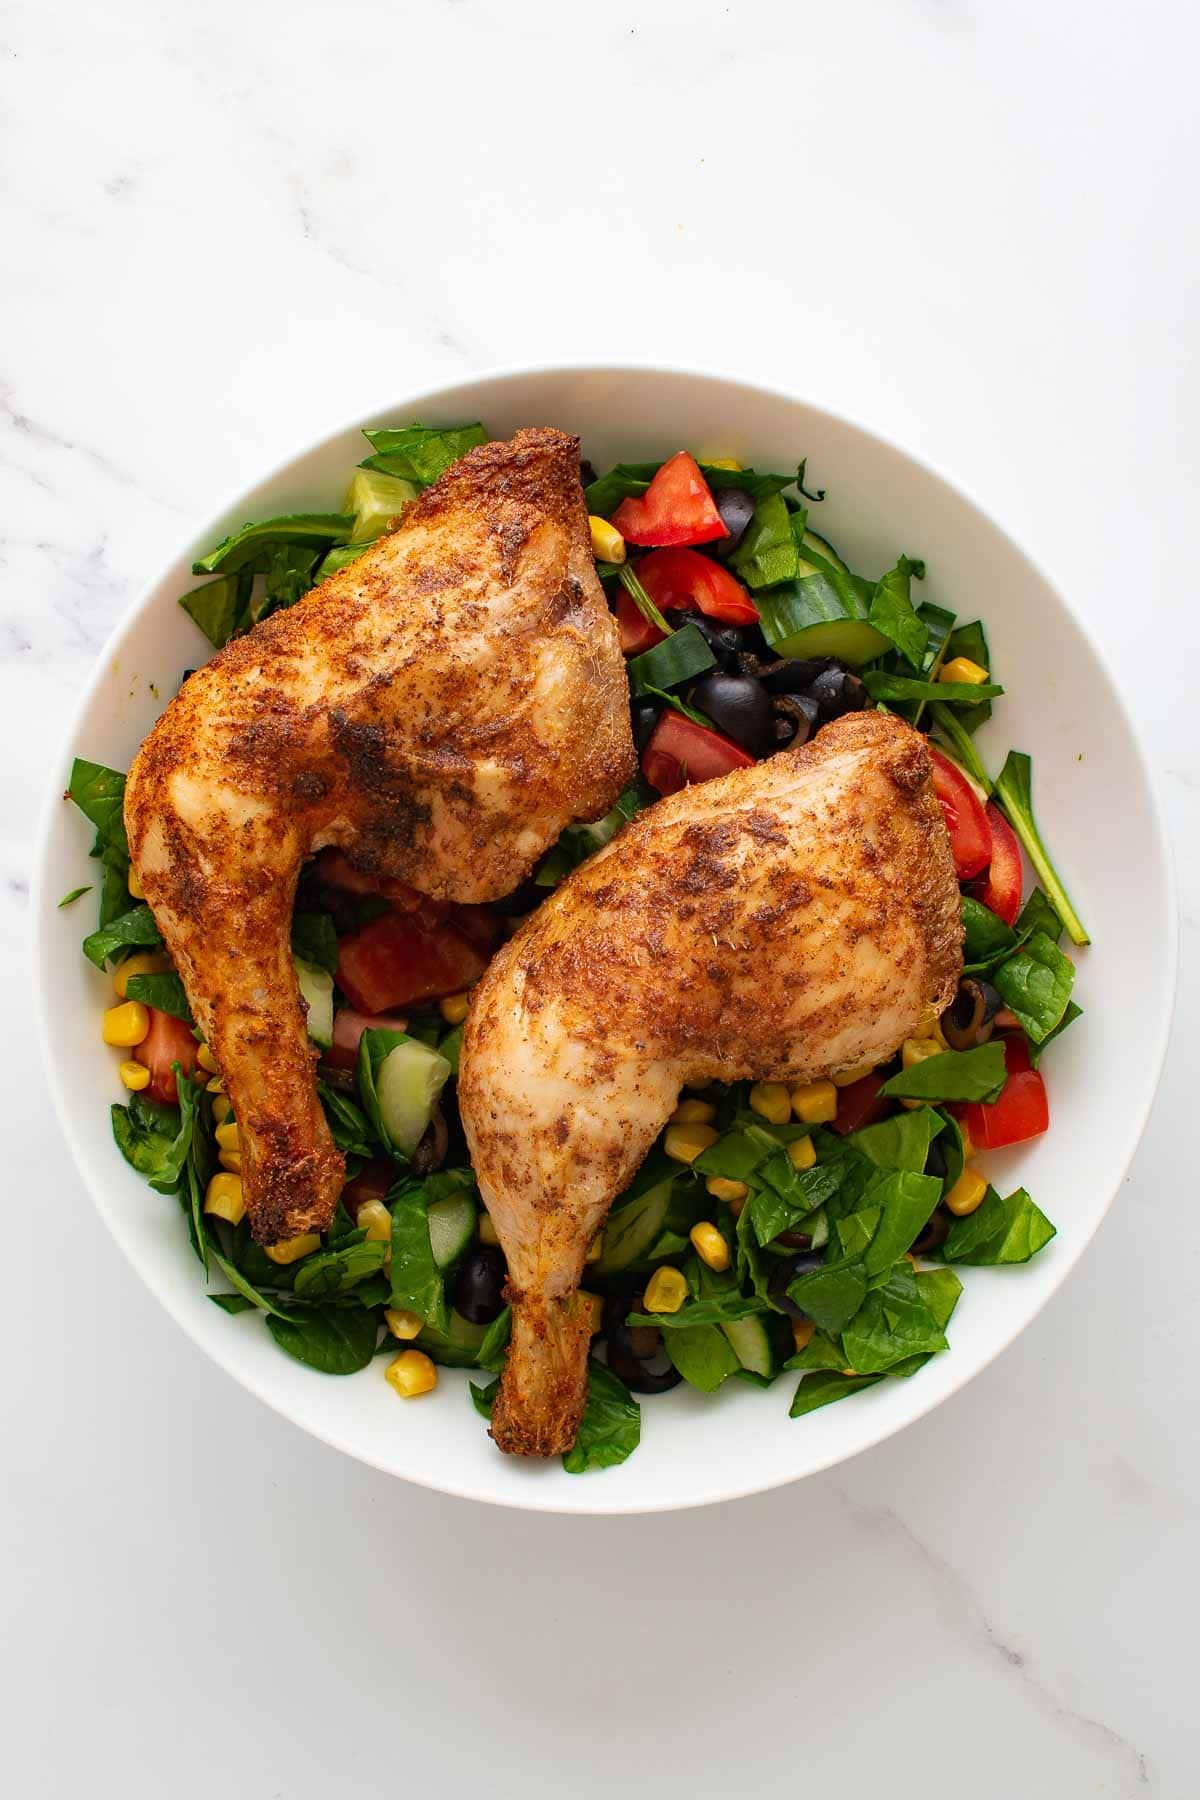 Crispy chicken leg quarters with salad.